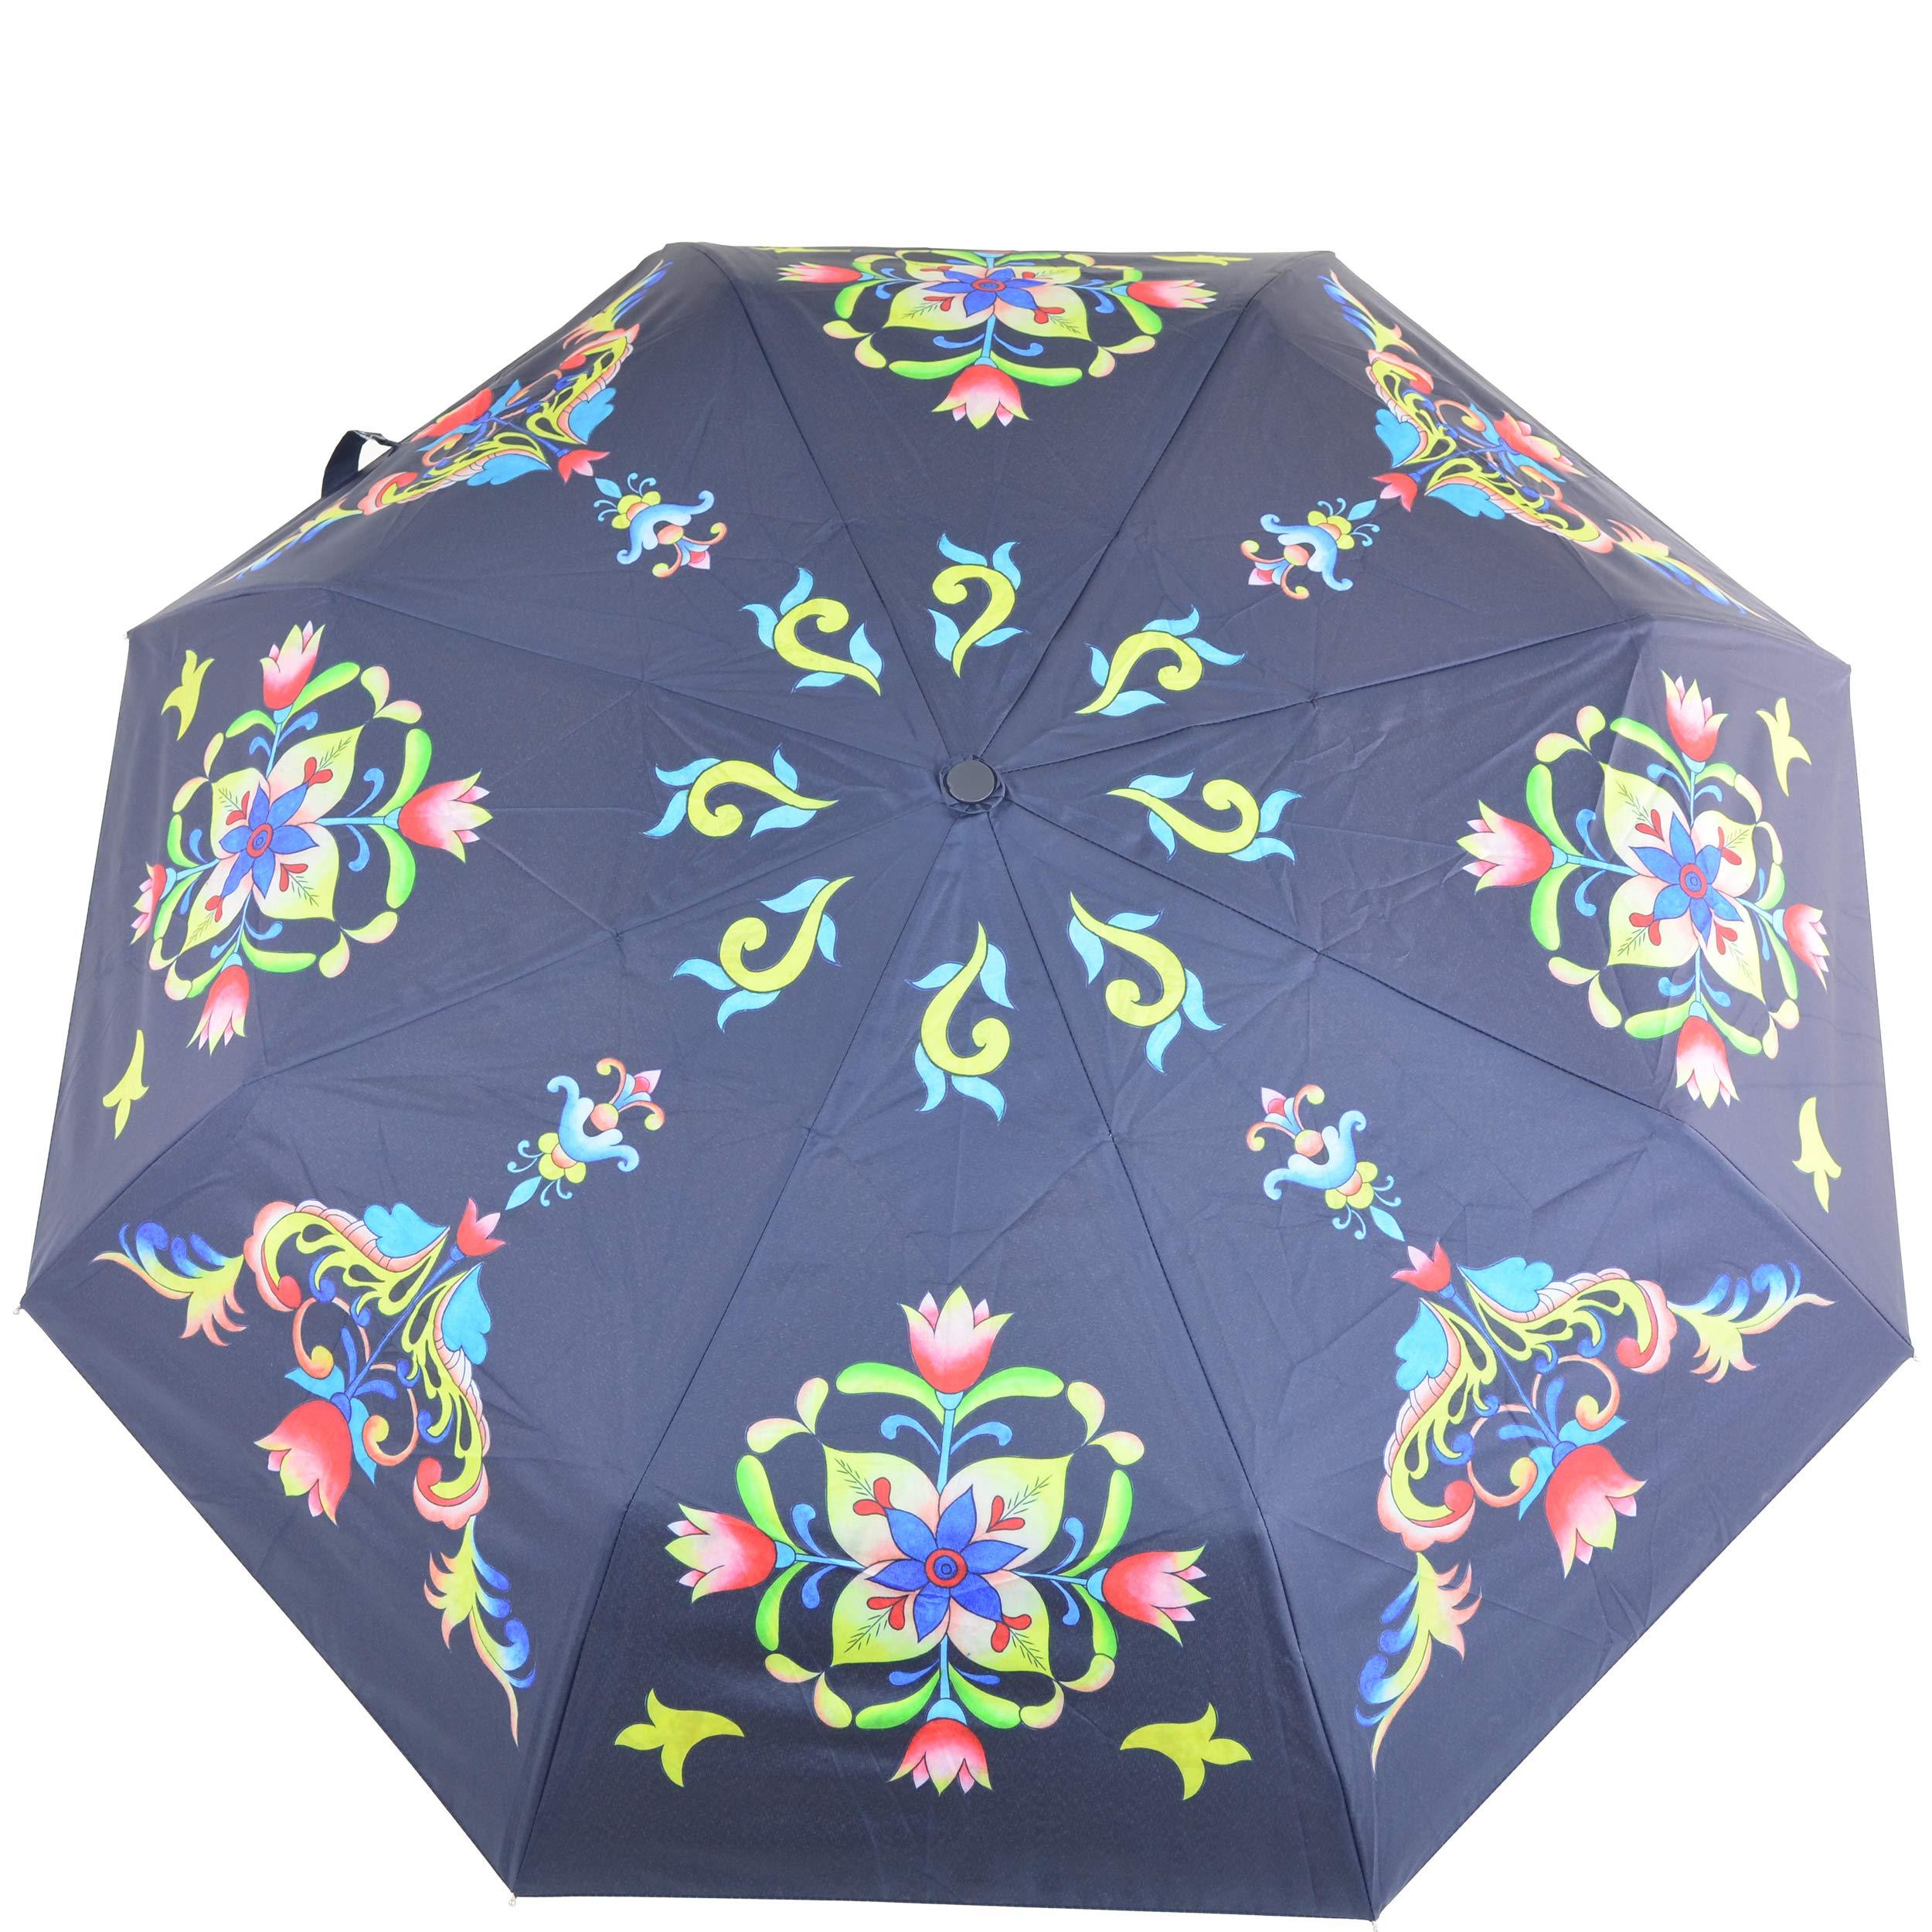 "Anuschka Umbrella AUTO Open/Close   UPF 50+ Max Sun protection   38"" Waterproof Canopy   Fits in Handbag   Windproof Flexible Fiberglass   Tuscan Tiles"